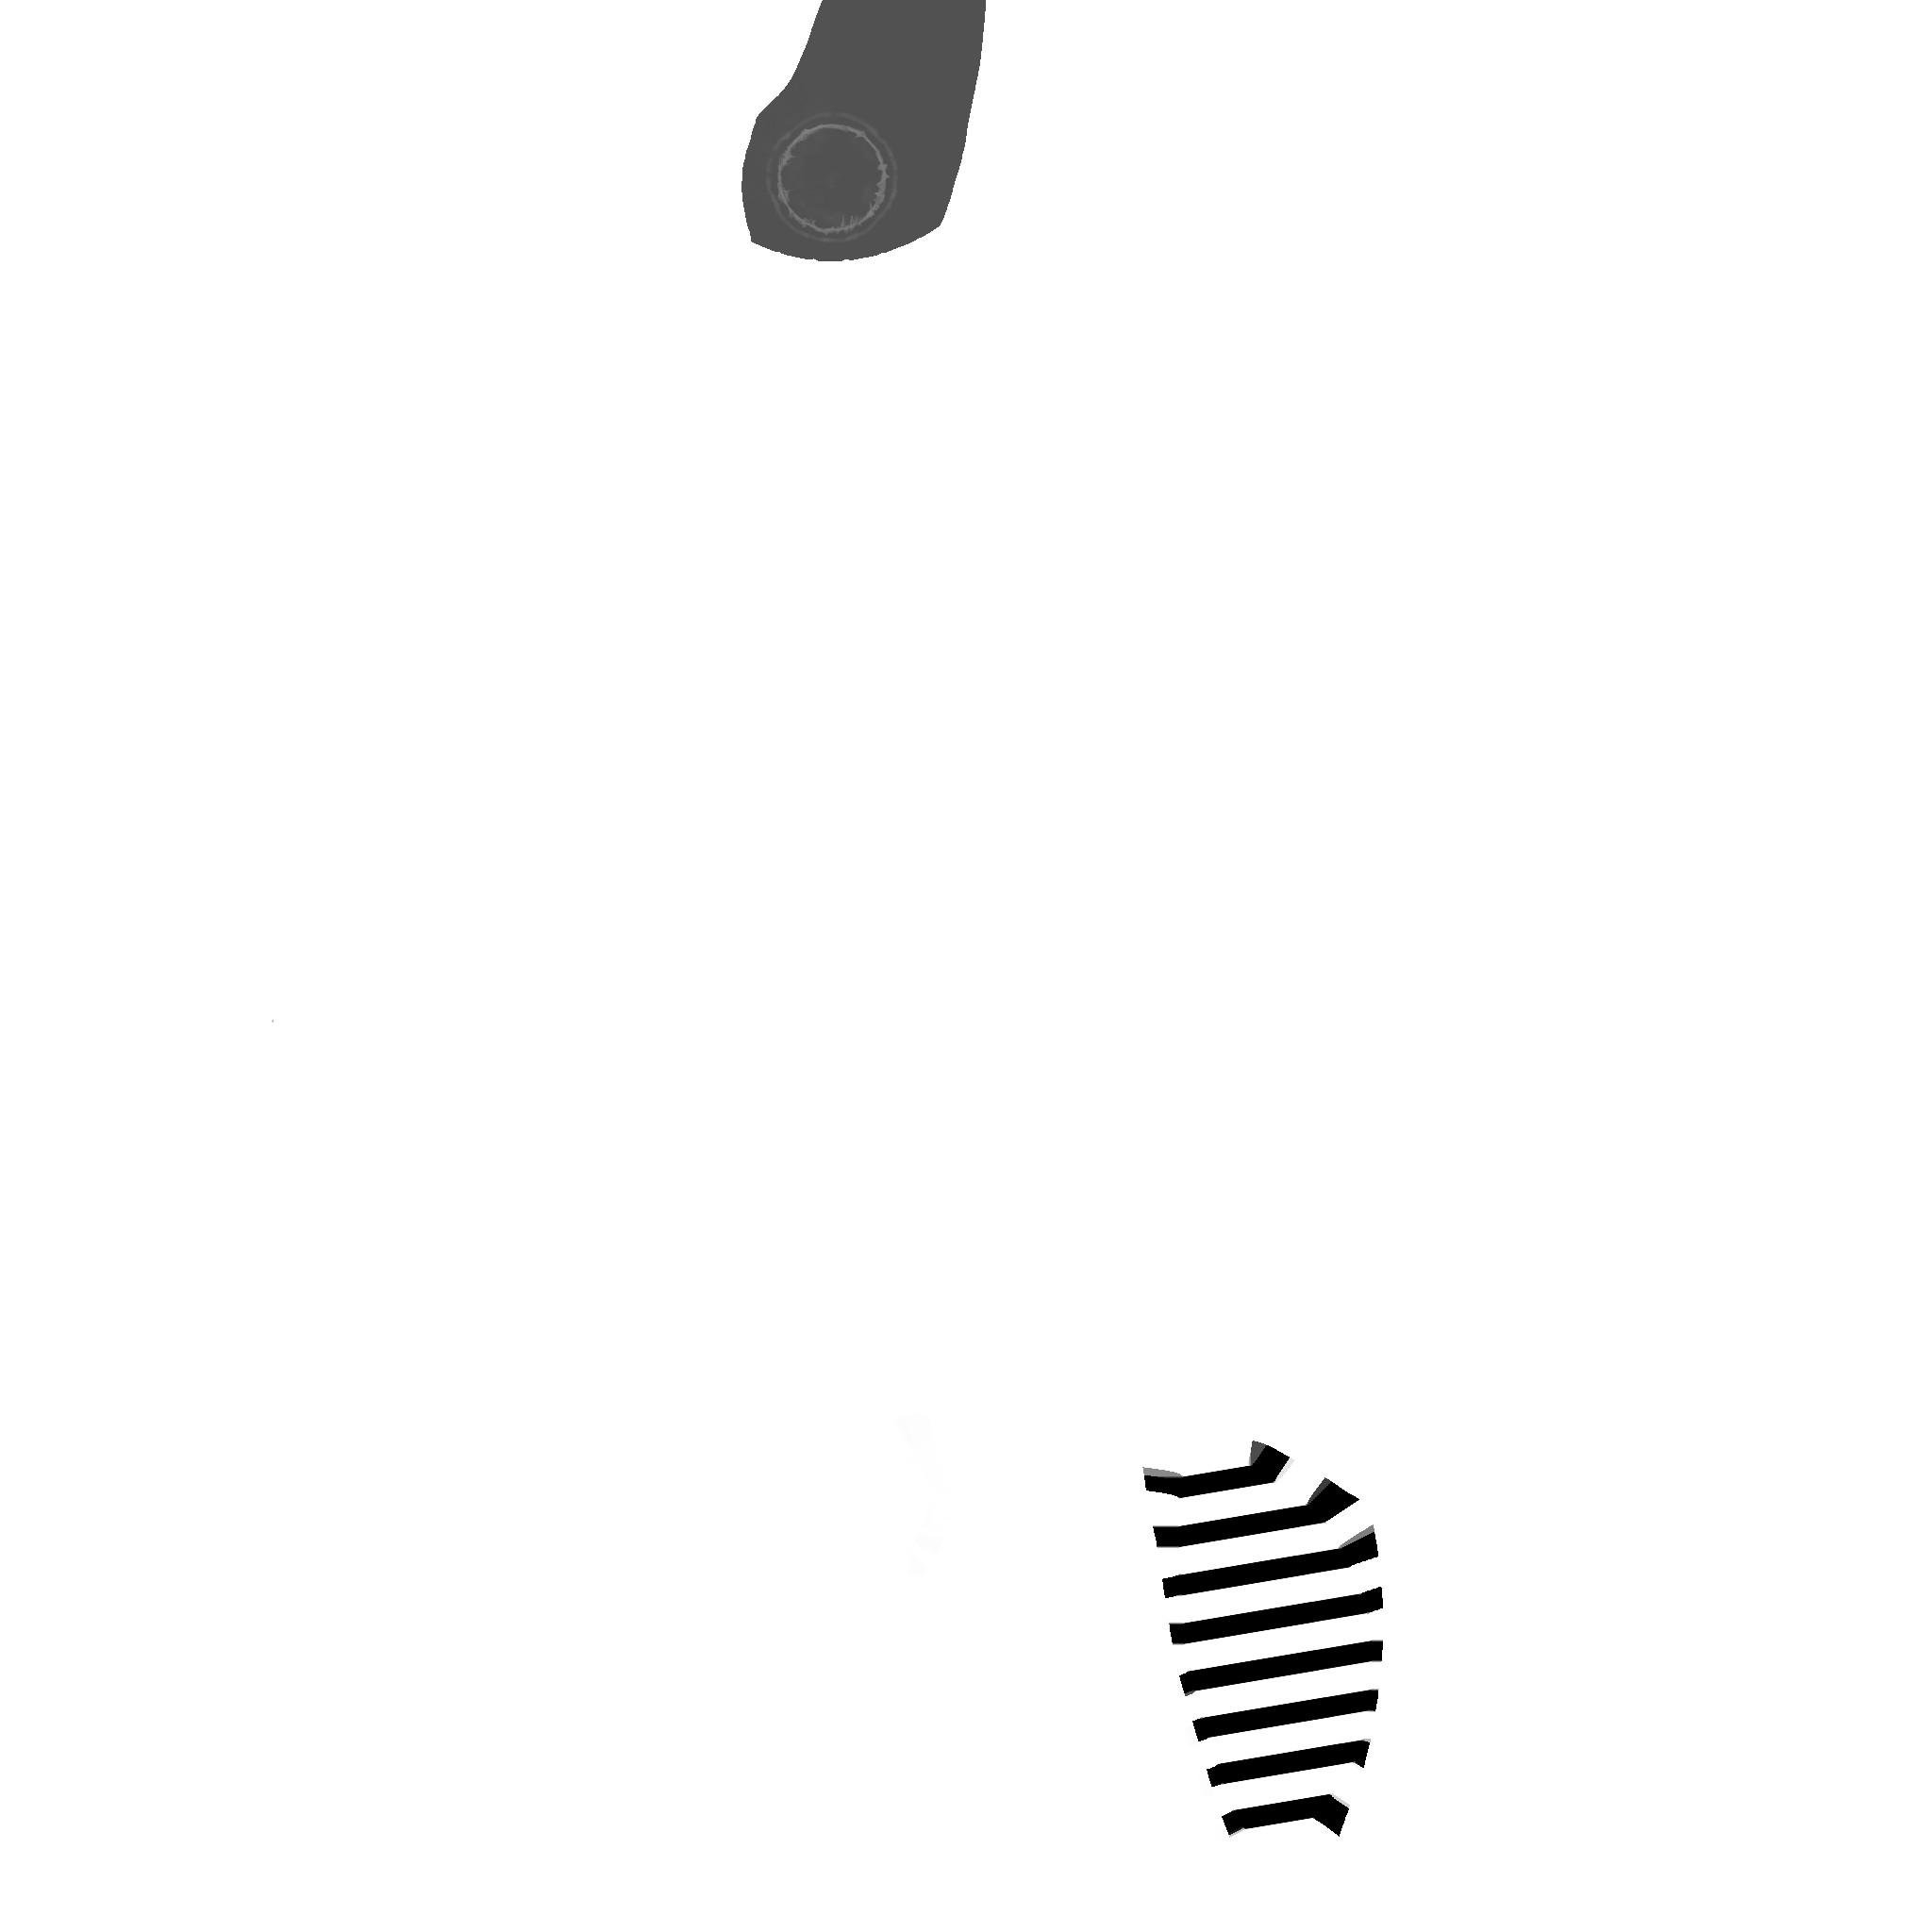 SmallBoiler_opacity.jpg